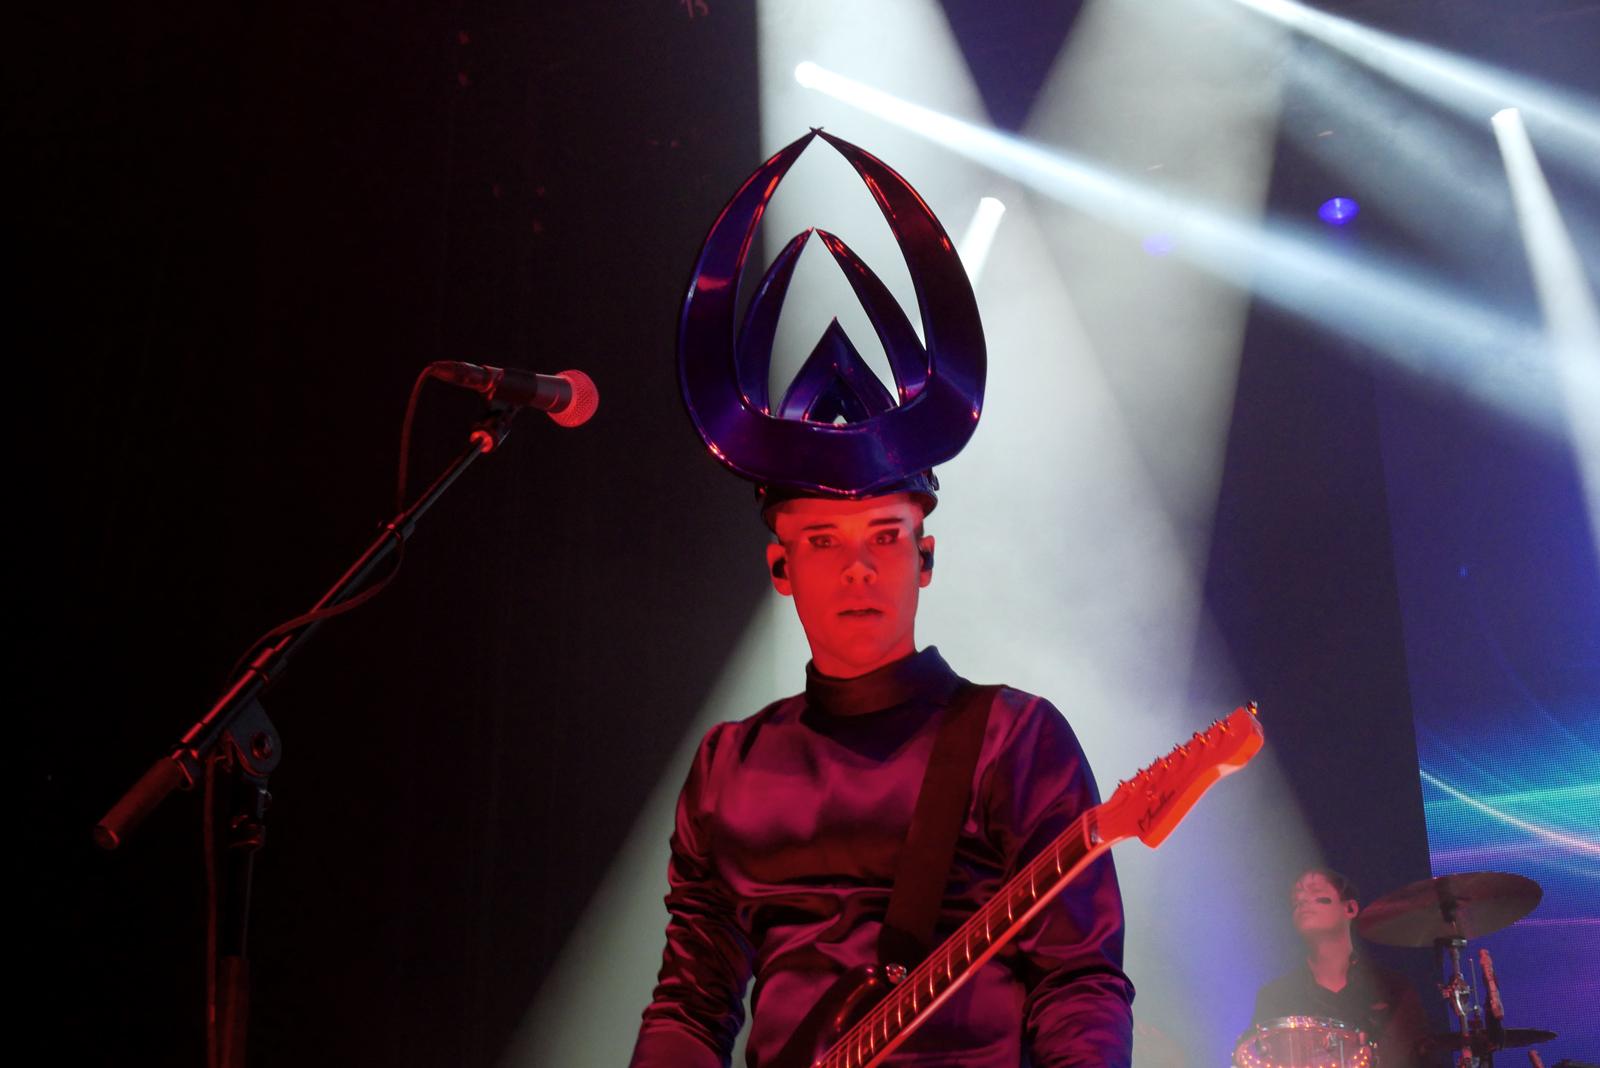 luke-steele-eyes-empire-of-the-sun-concert-paris-olympia-two-vines-tour-live-stage-photo-usofparis-blog